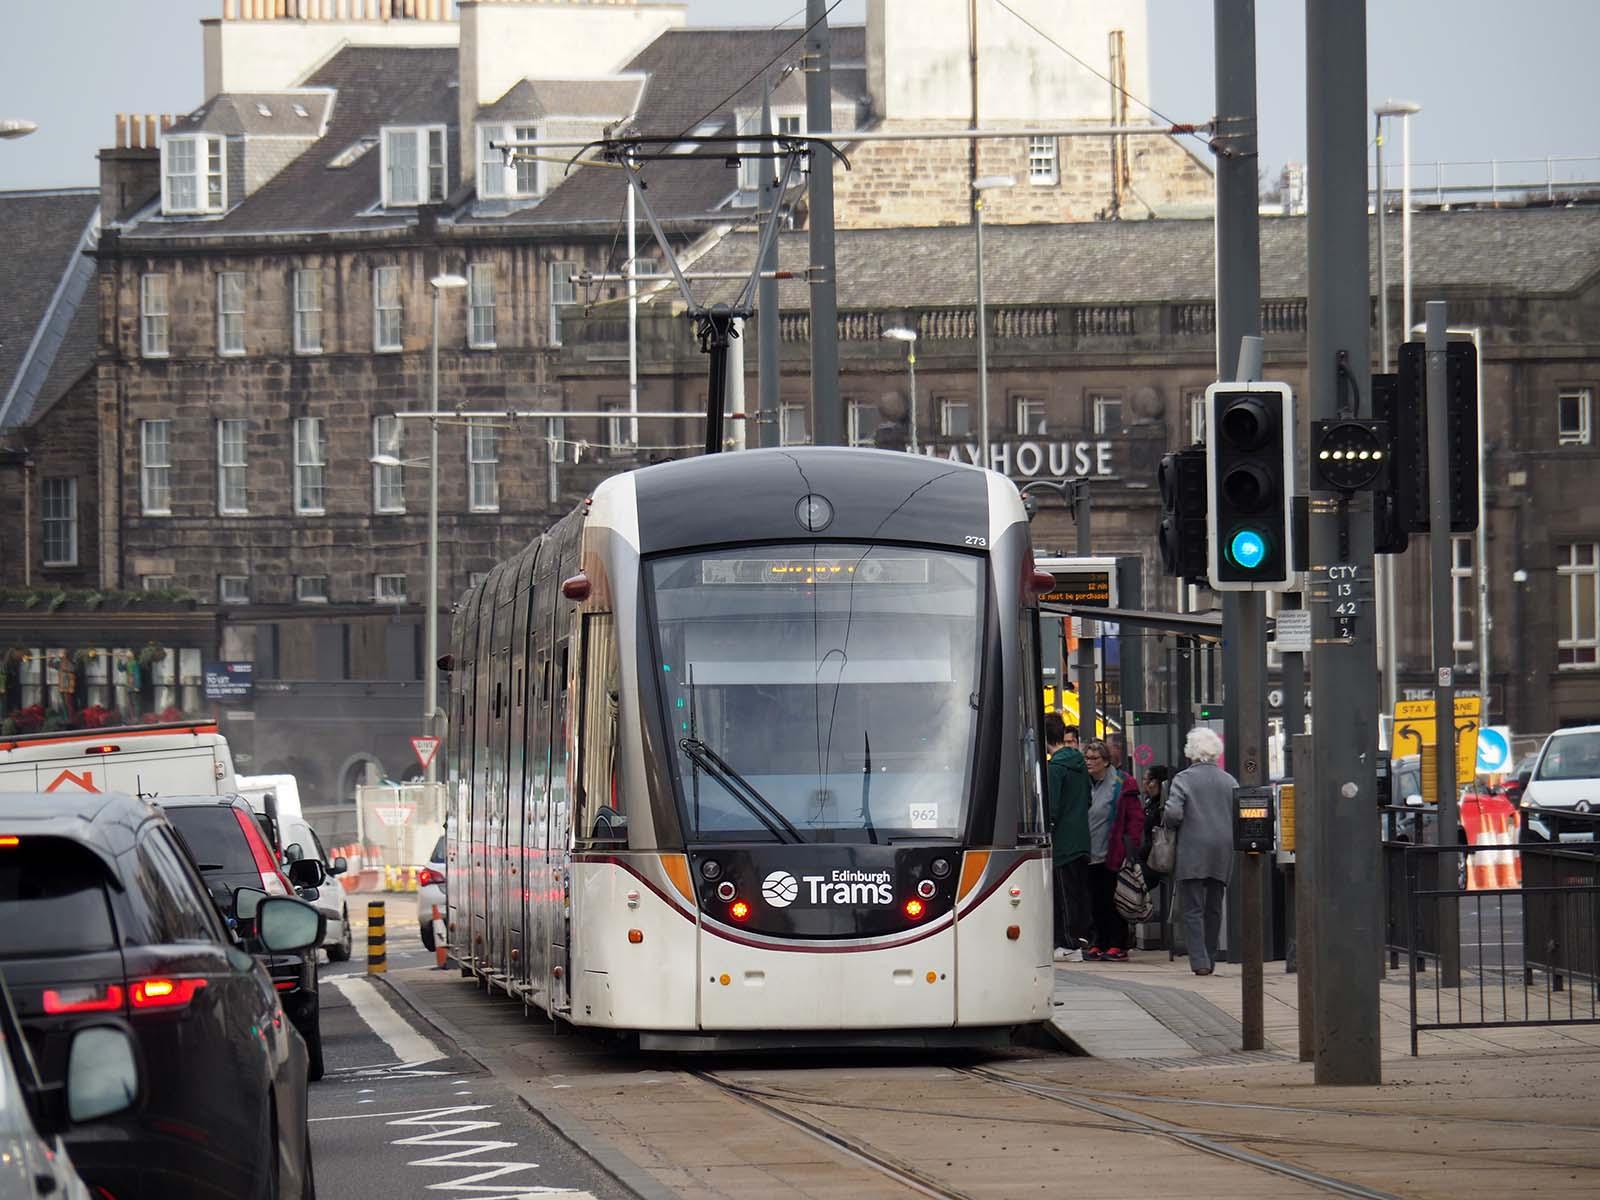 TramForward welcomes plans for Edinburgh tram expansion